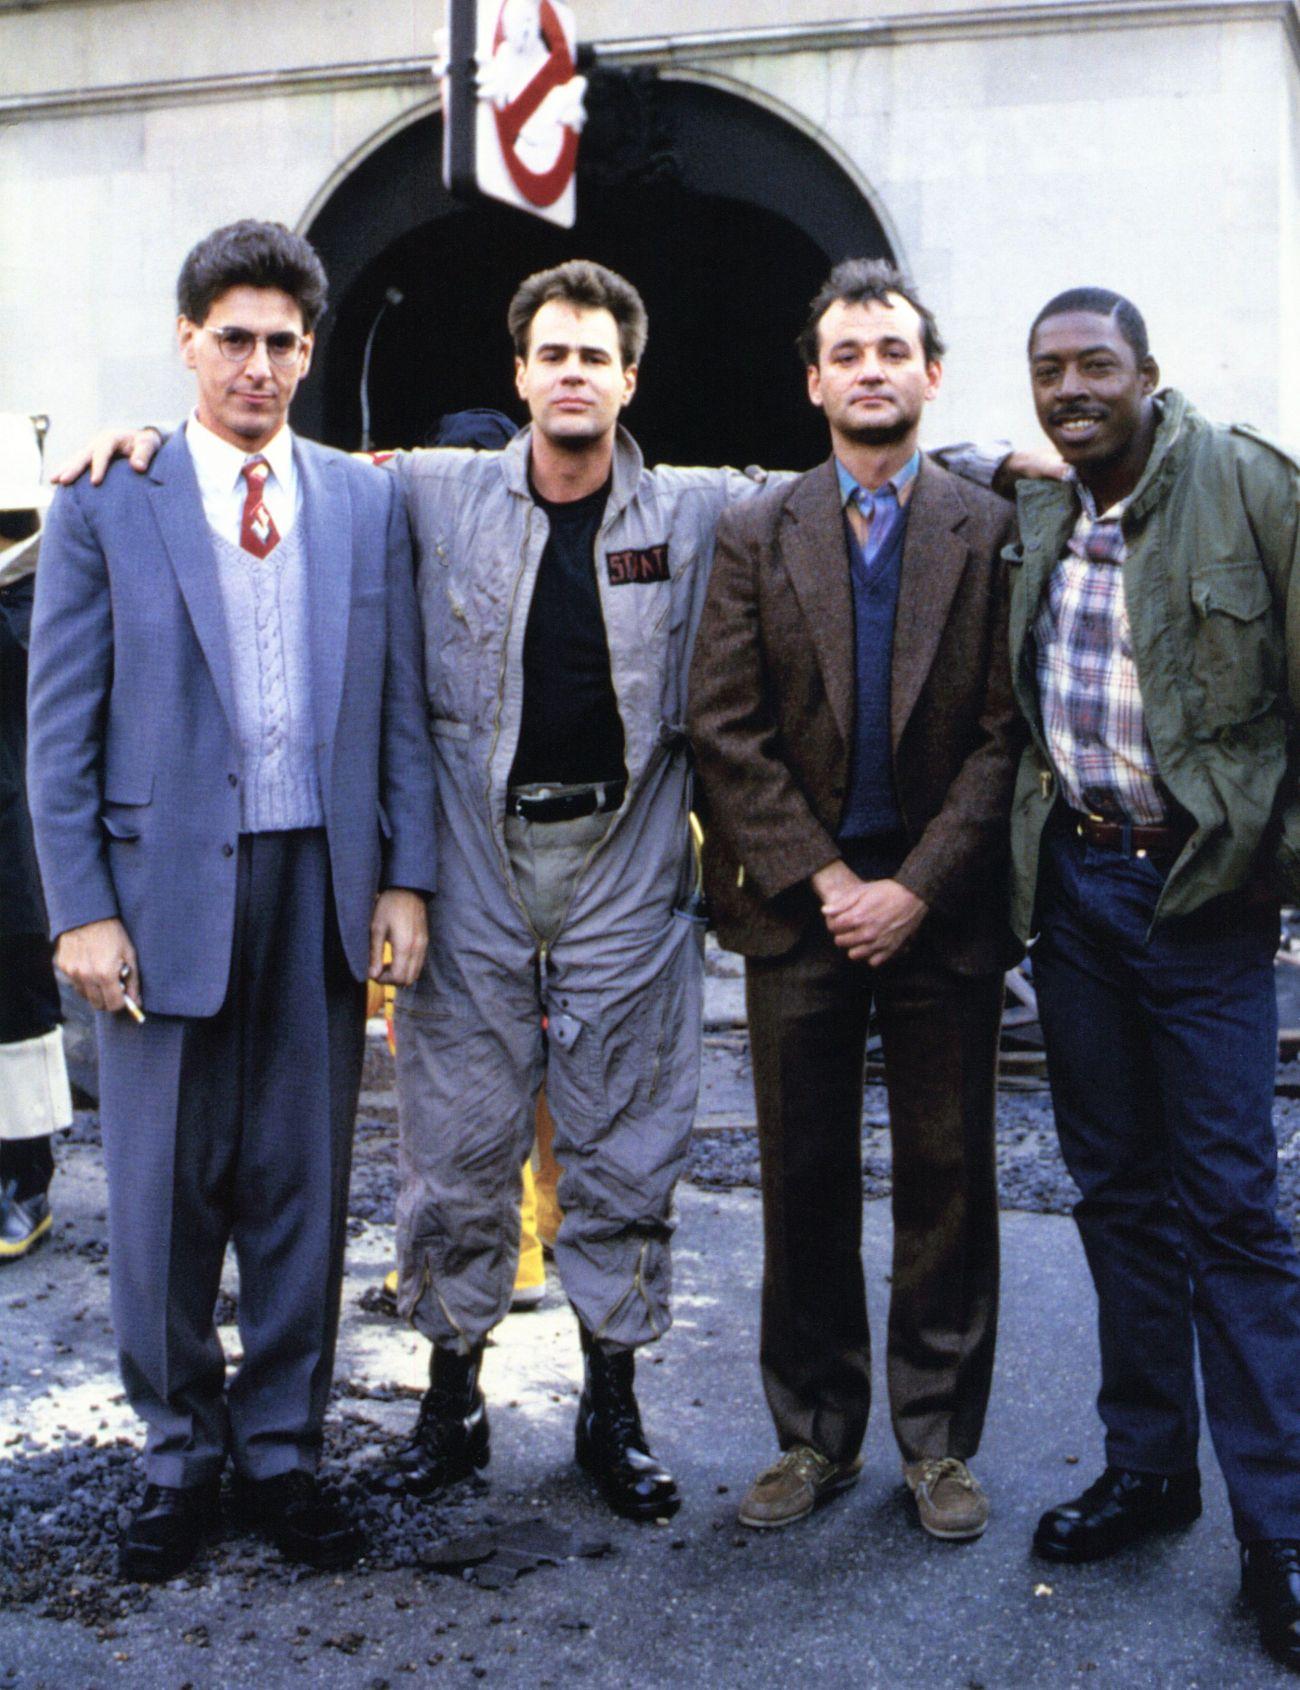 Harold Ramis (1944-2014) como el Dr. Egon Splenger, Dan Aykroyd como el Dr. Ray Stantz, Bill Murray como el Dr. Peter Venkman y Ernie Hudson como Winston Zeddemore en el set de Ghostbusters (1984). Imagen: pinterest.com